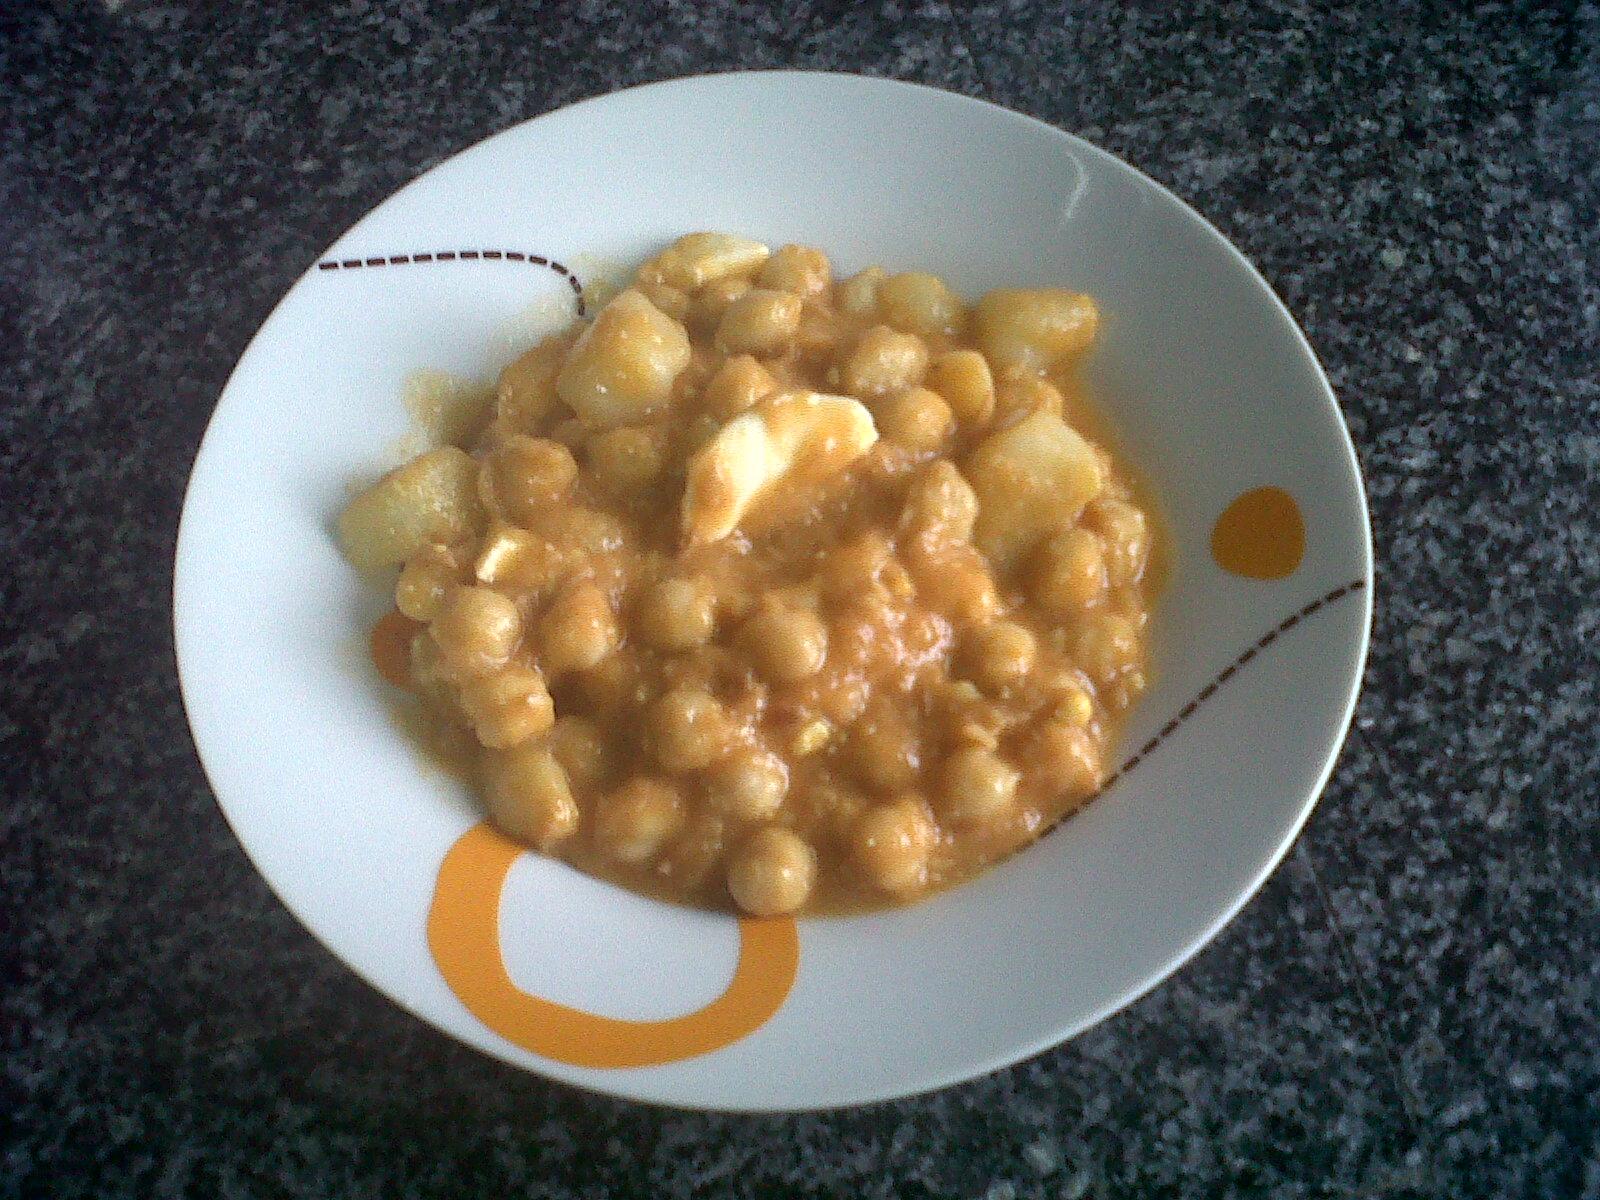 Garbanzos con at n y huevo cocido 4 2 5 - Garbanzos olla express ...